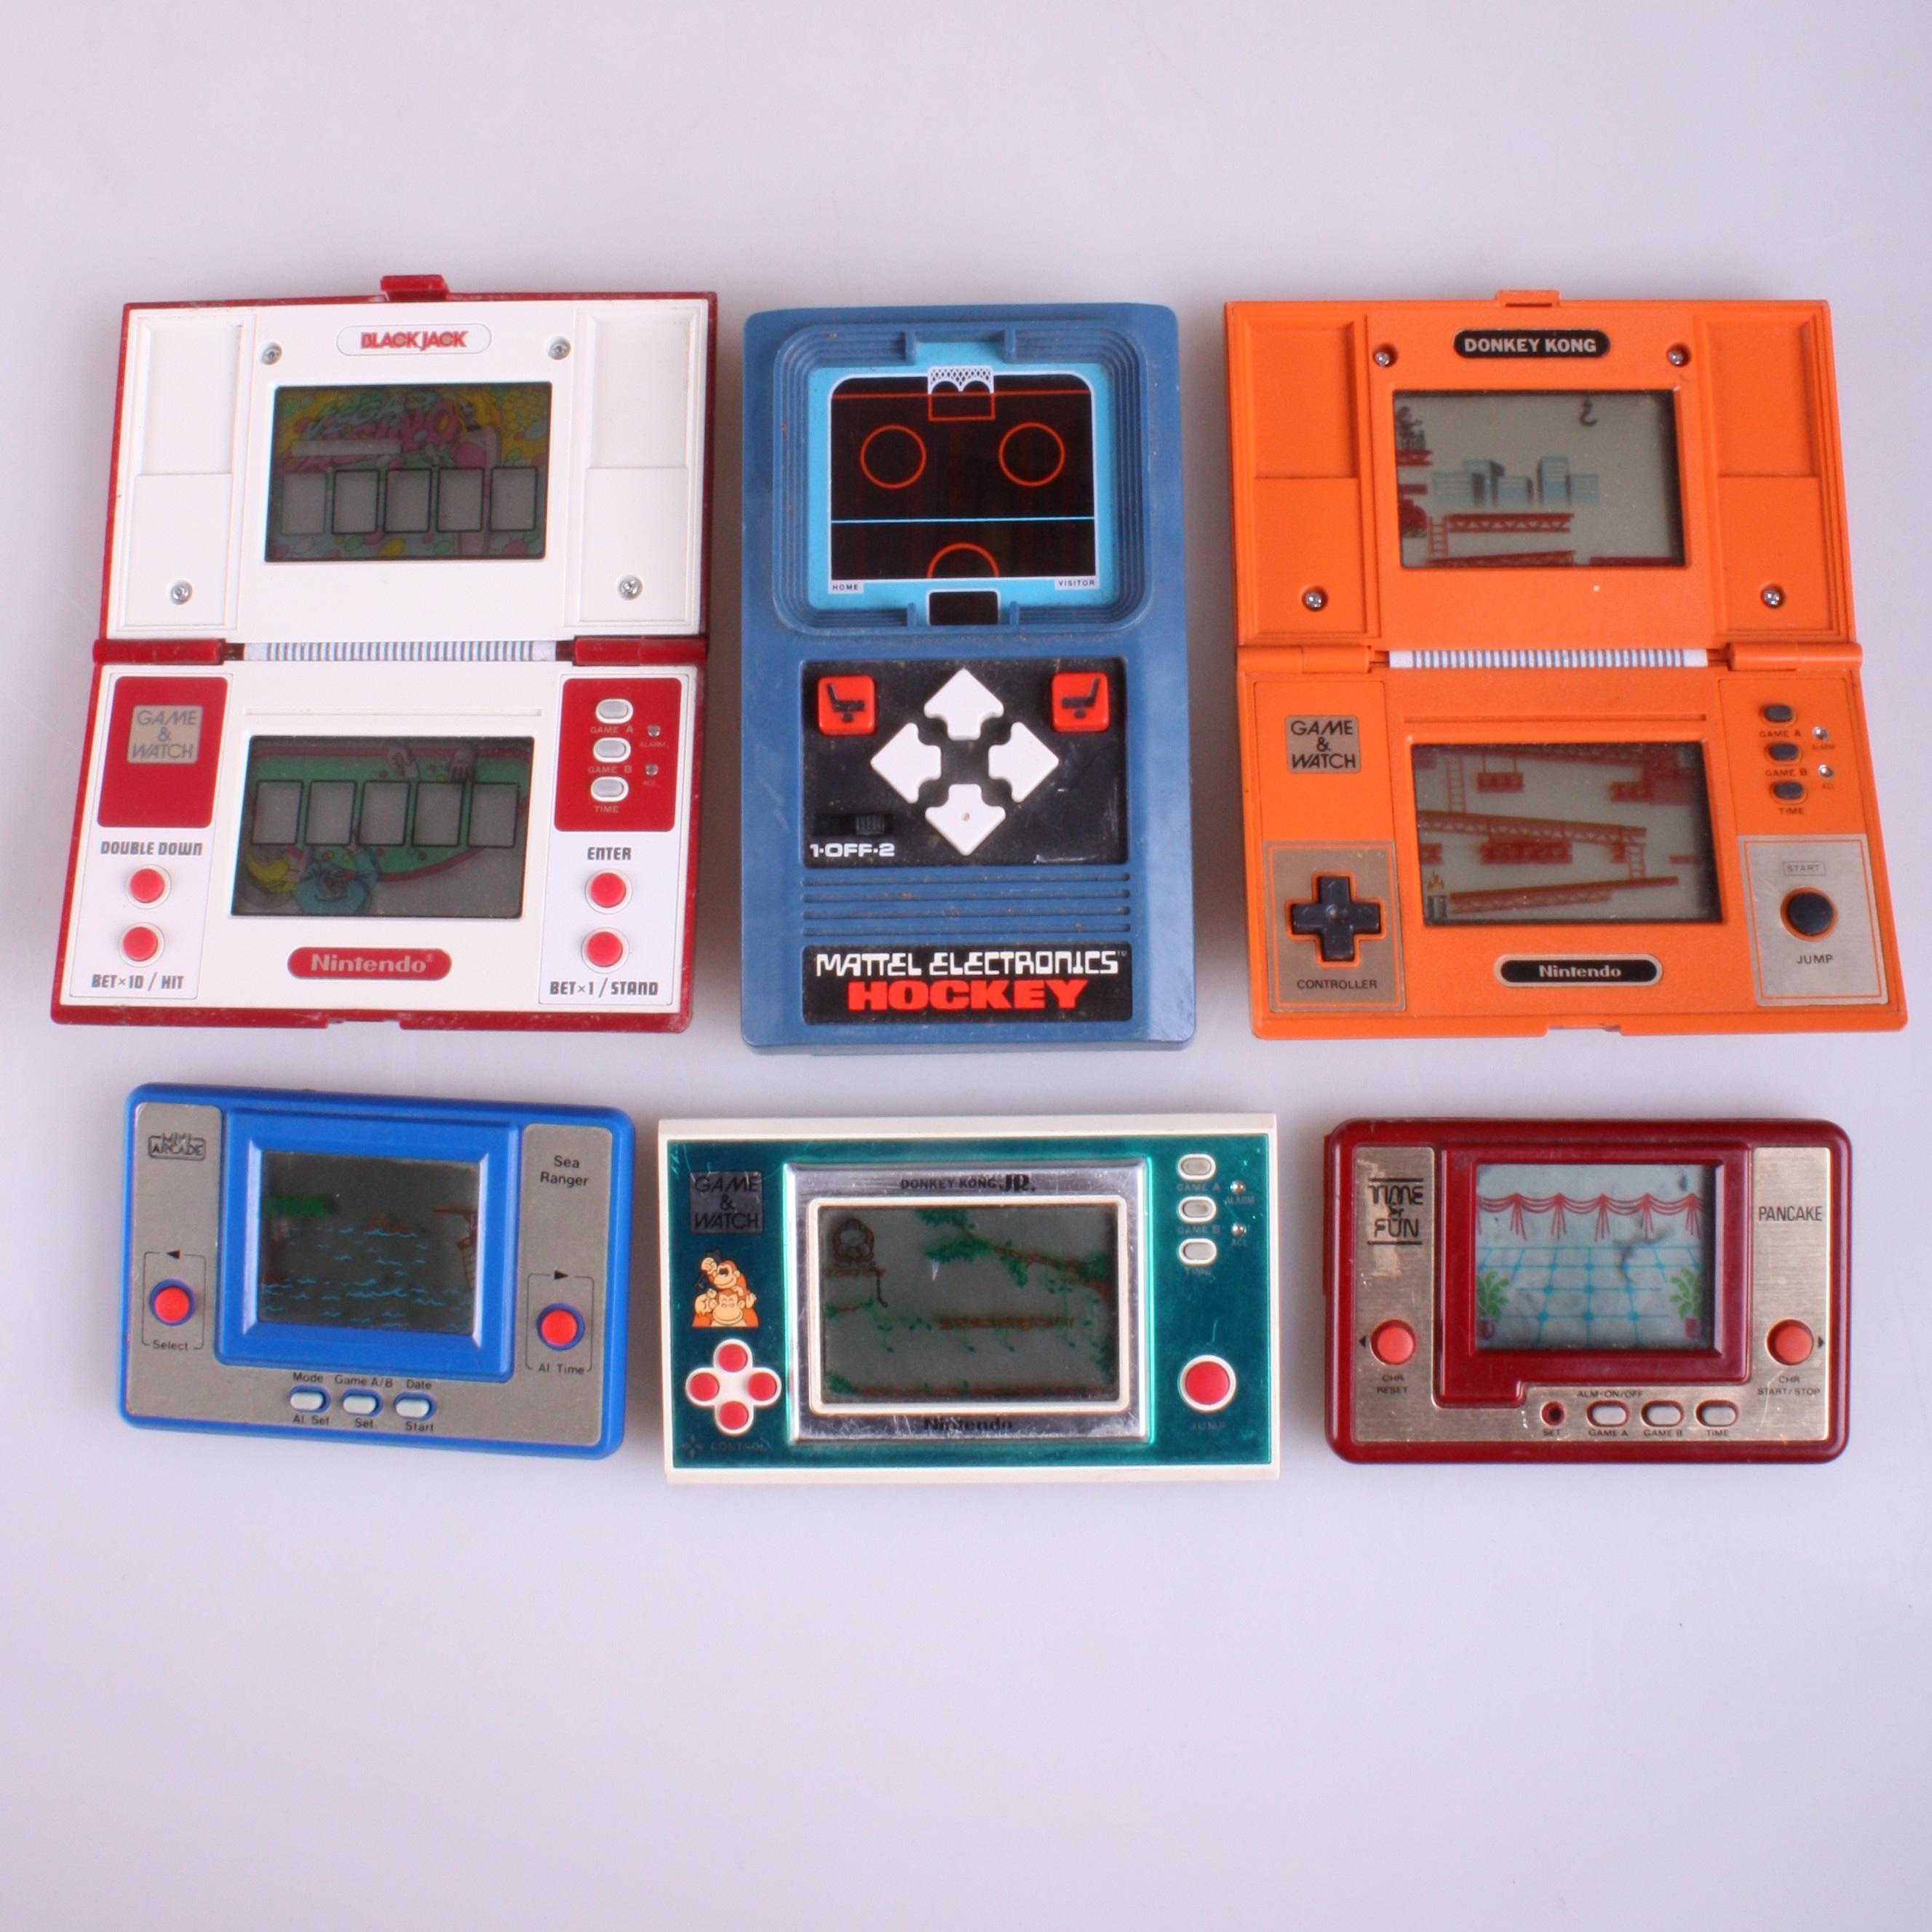 Wonderbaar SPEL, vintage spel, 6 st, bla. Donkey Kong & Sea ranger. Toys KY-17